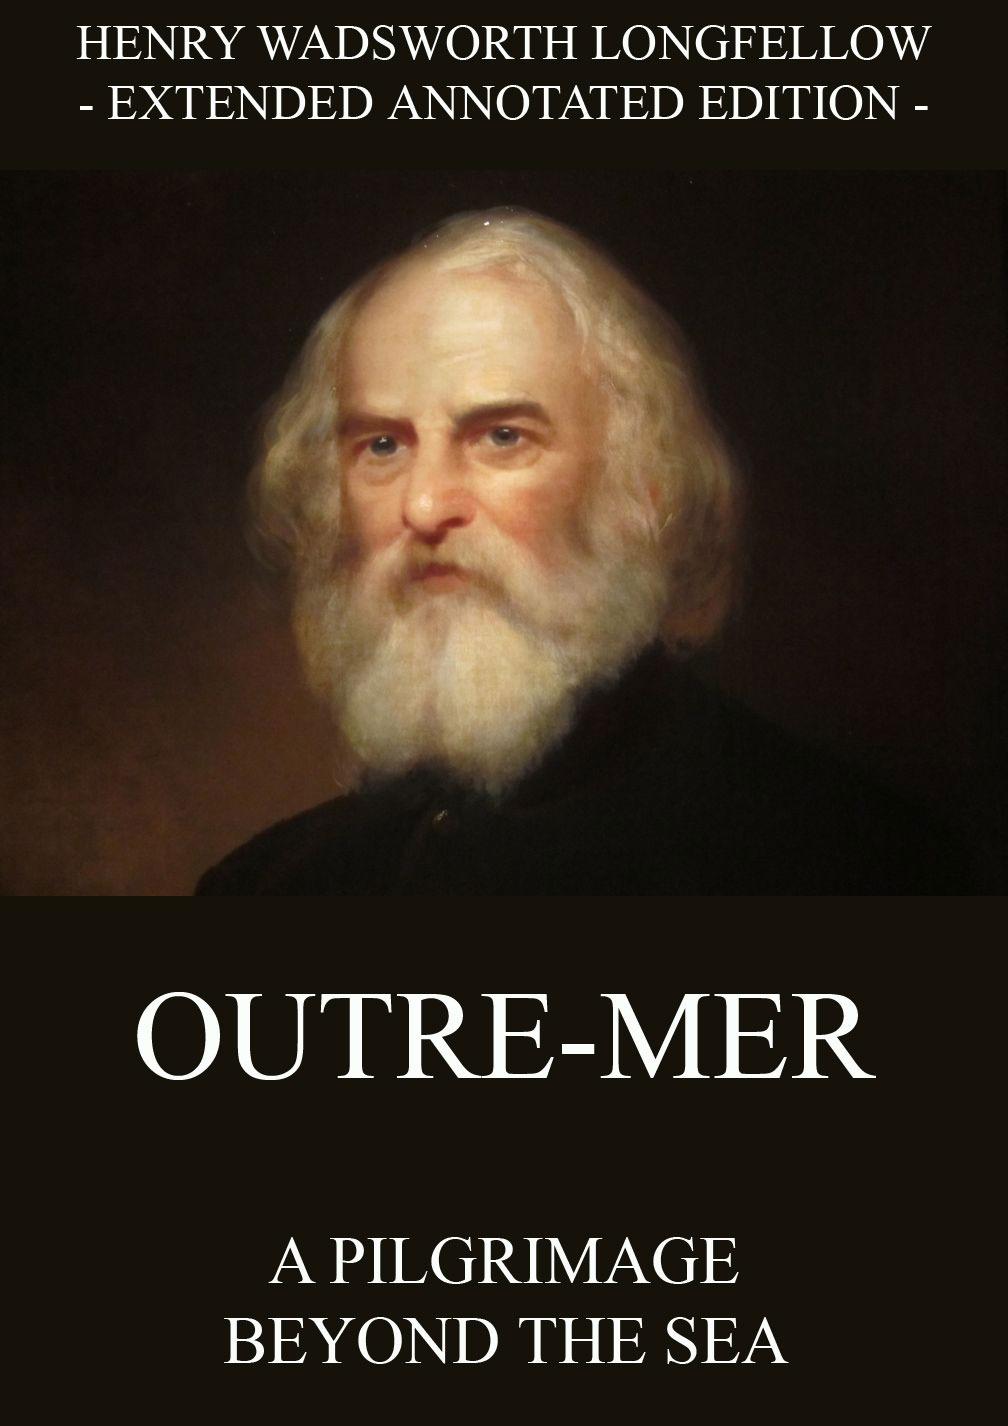 Генри Уодсуорт Лонгфелло Outre-Mer - A Pilgrimage Beyond The Sea bourget paul outre mer impressions of america 2